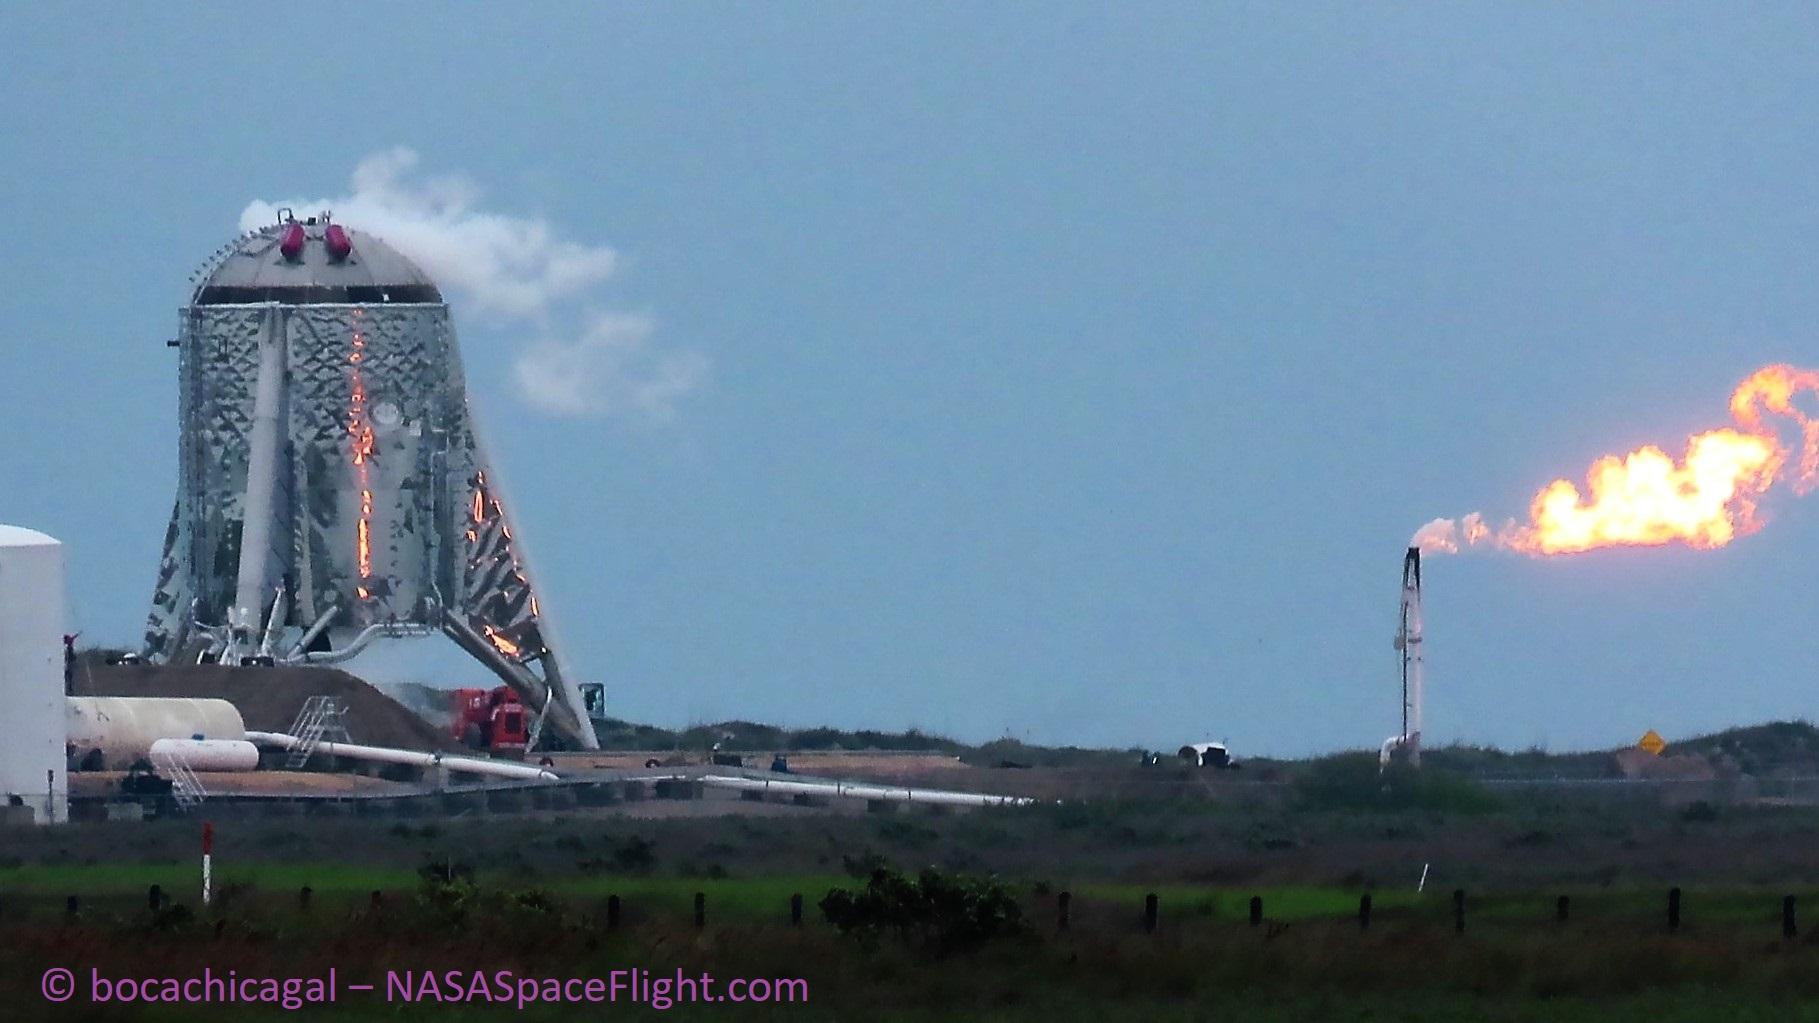 Boca Chica Starhopper testing 040119 (NASASpaceflight – bocachicagal) 3